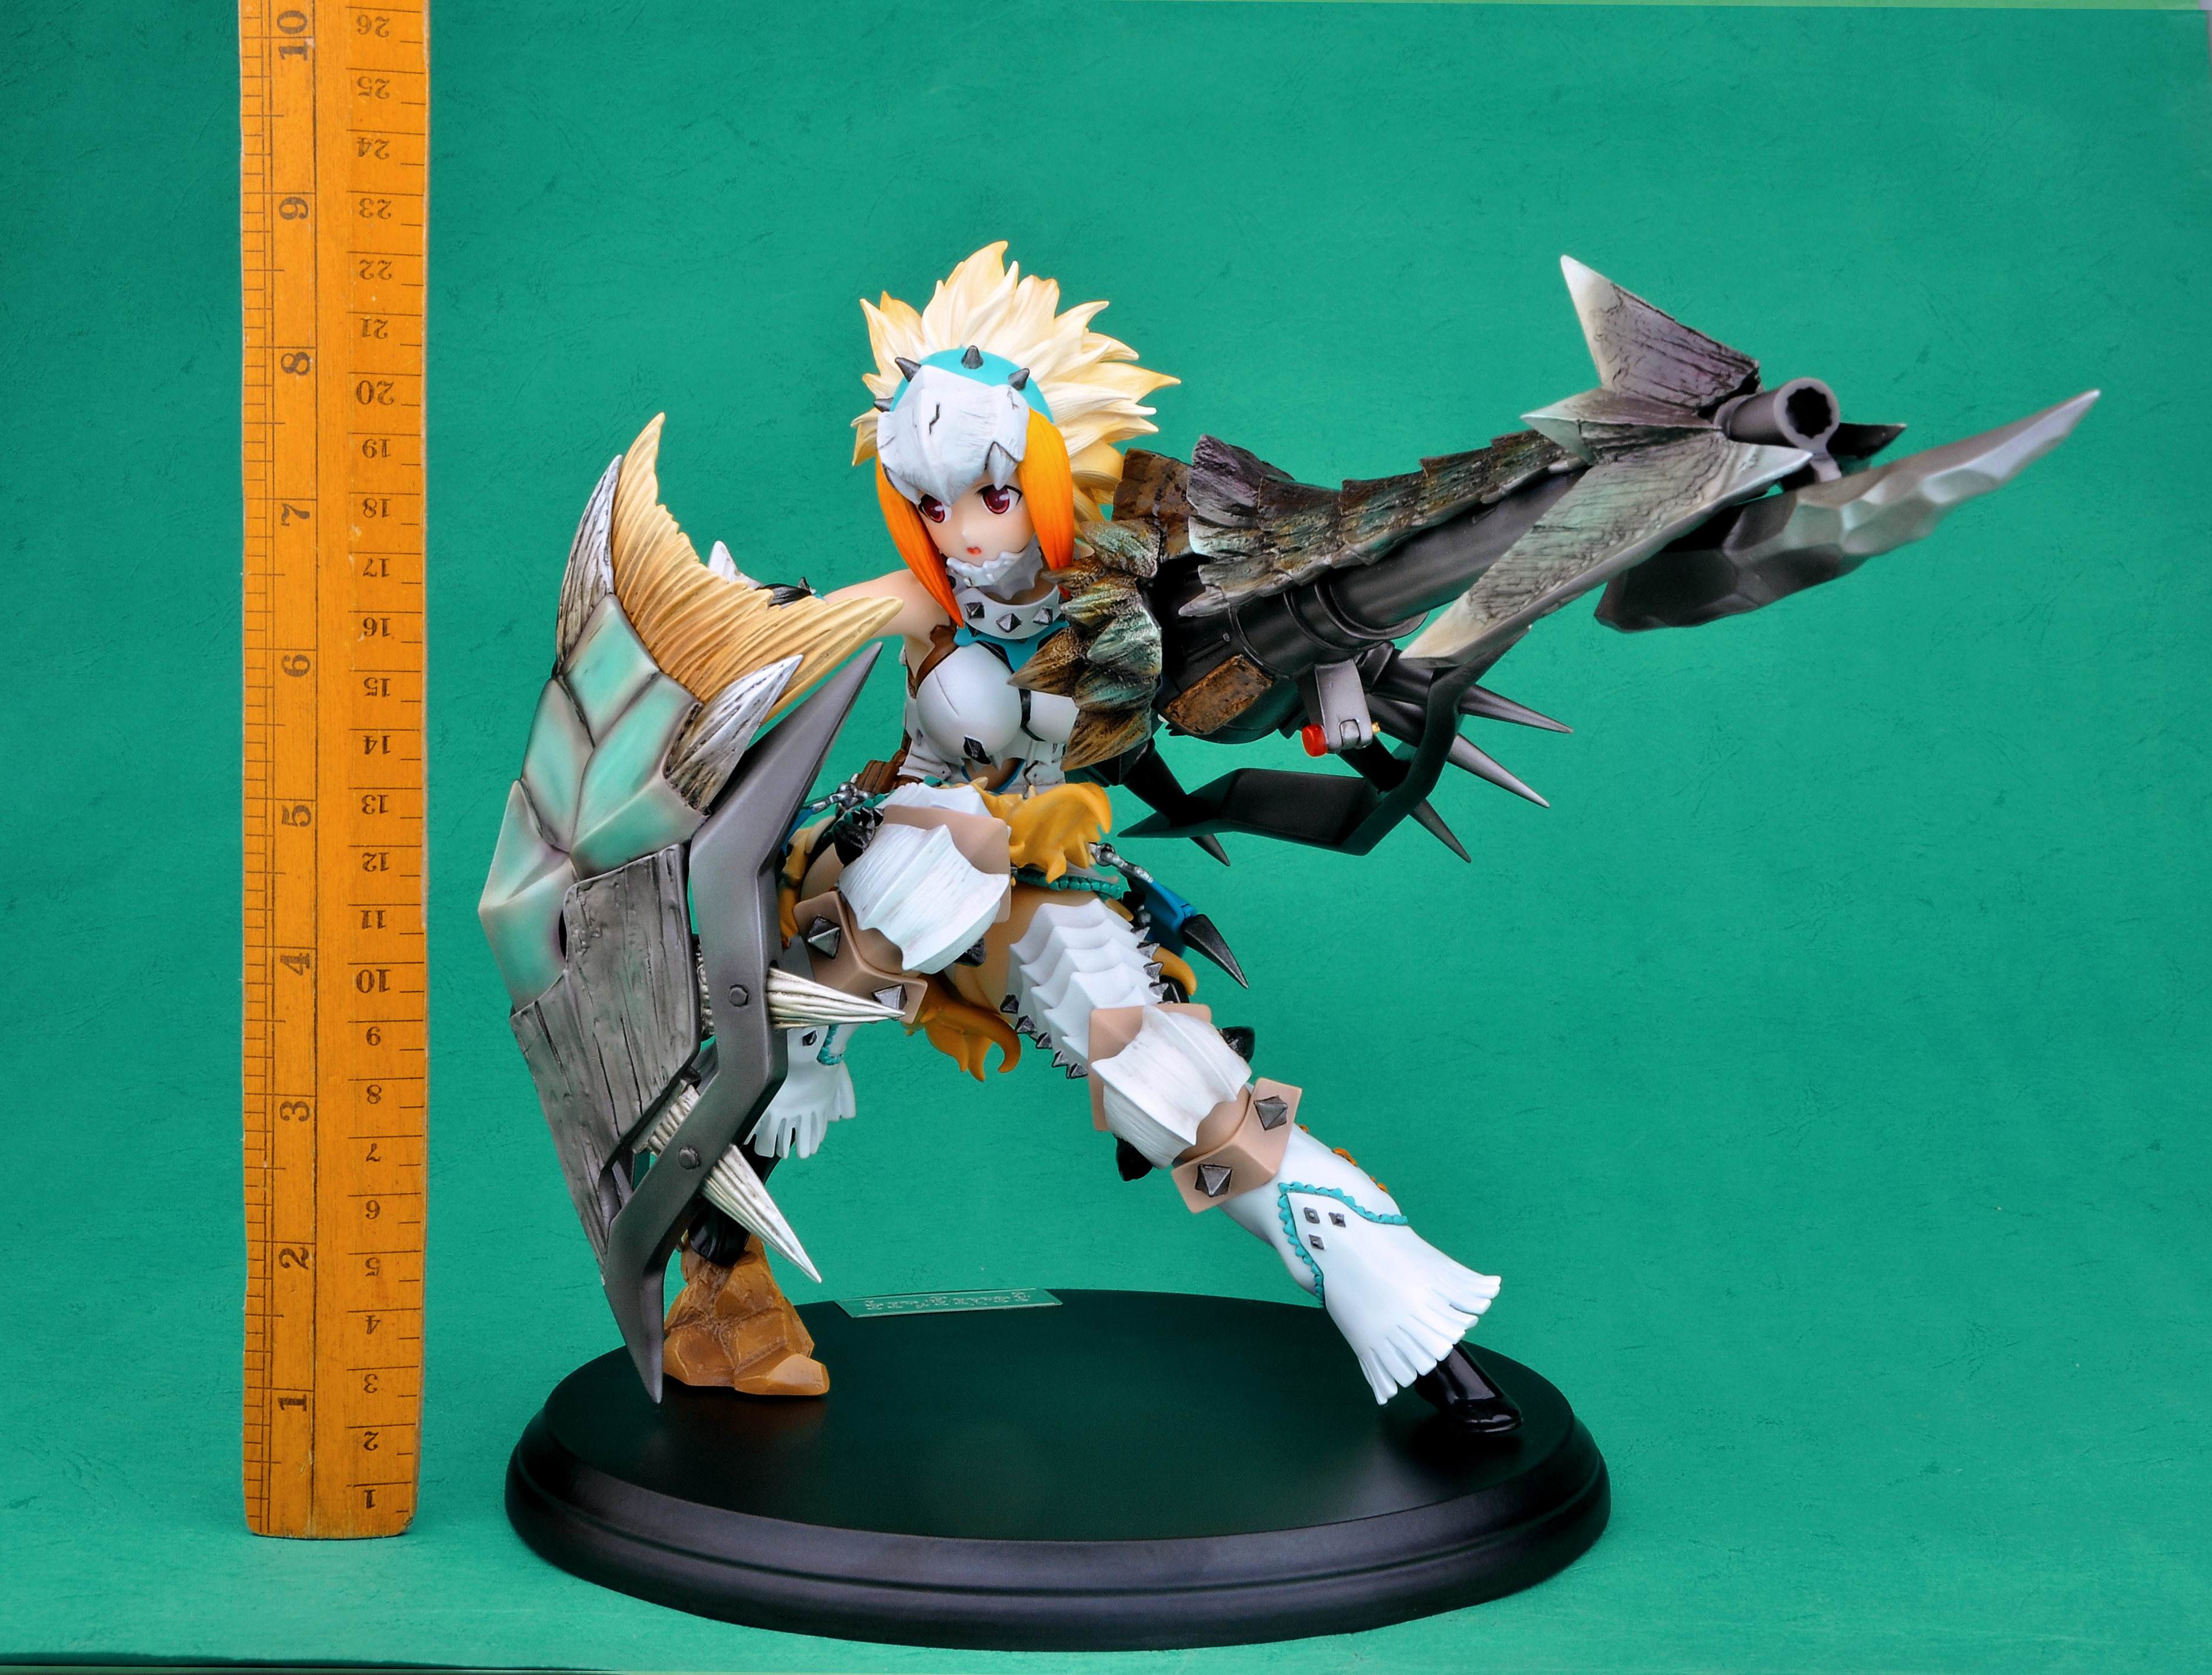 Berio Armor Hunter Monster Hunter prepainted figure haruhichan.com Monster Hunter video game figure 14